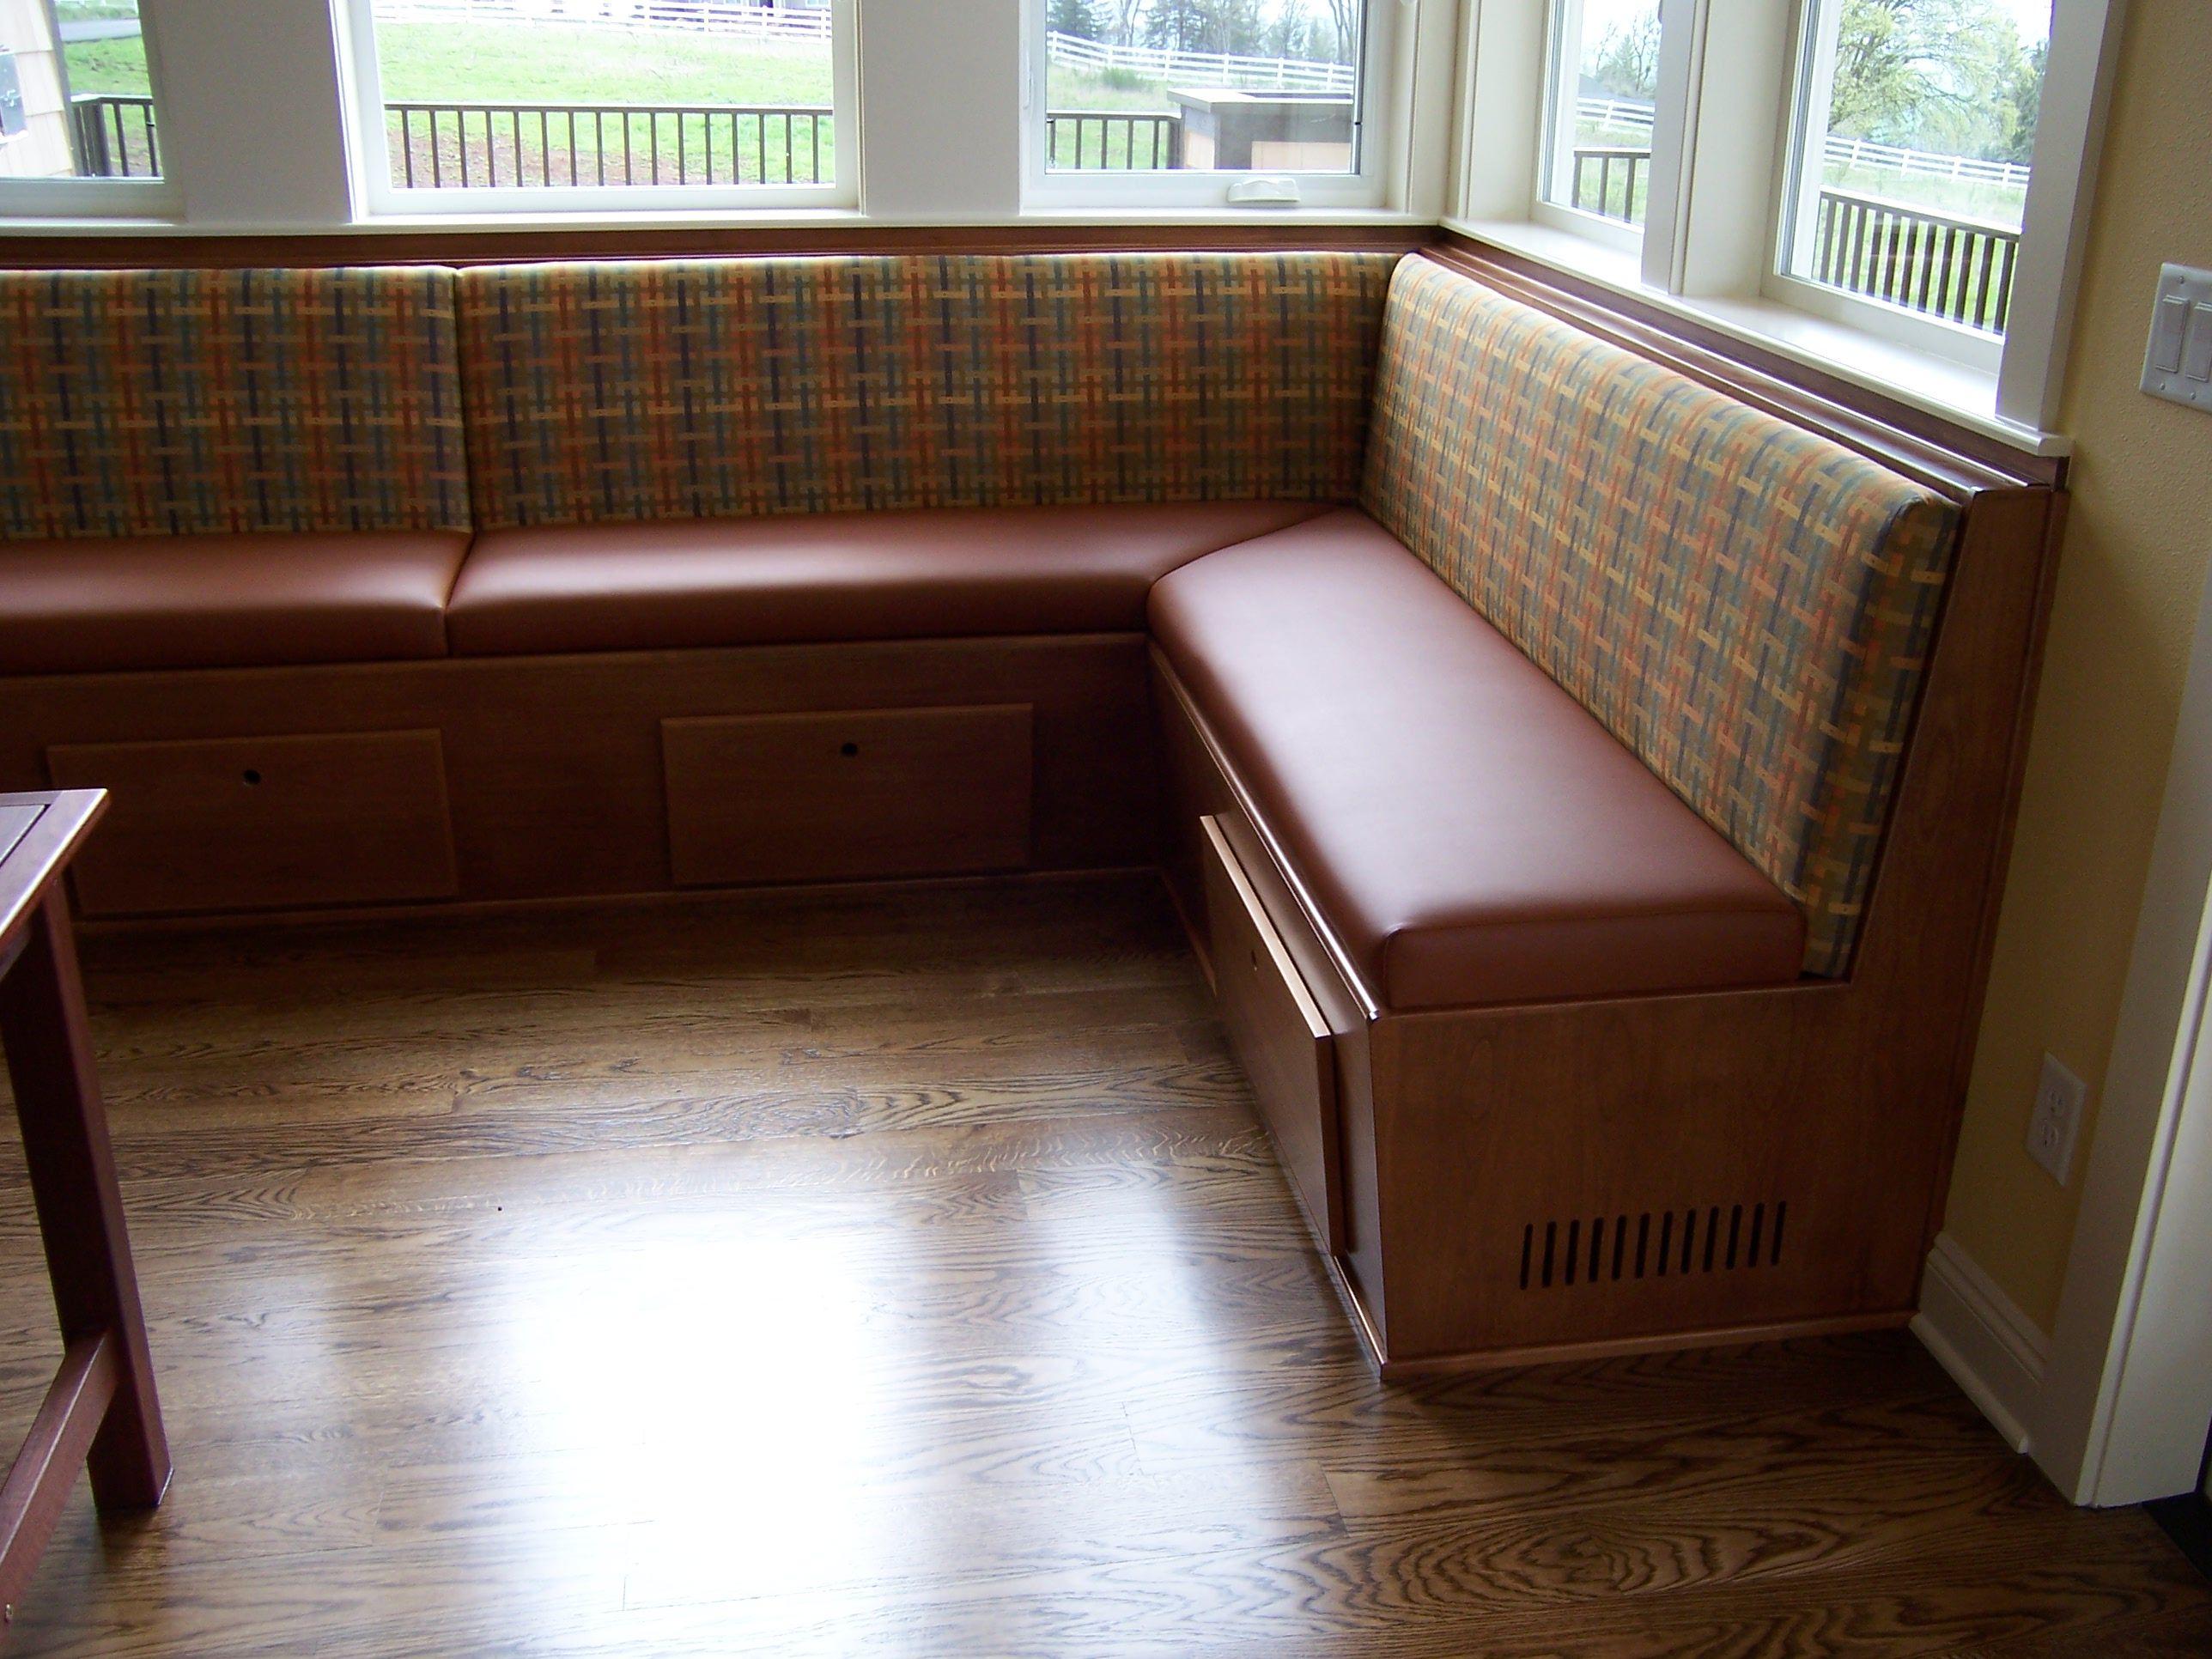 Thoet Banquettes Dark Jpg 2 576 1 932 Pixels Corner Bench Dining Set Breakfast Nook Set